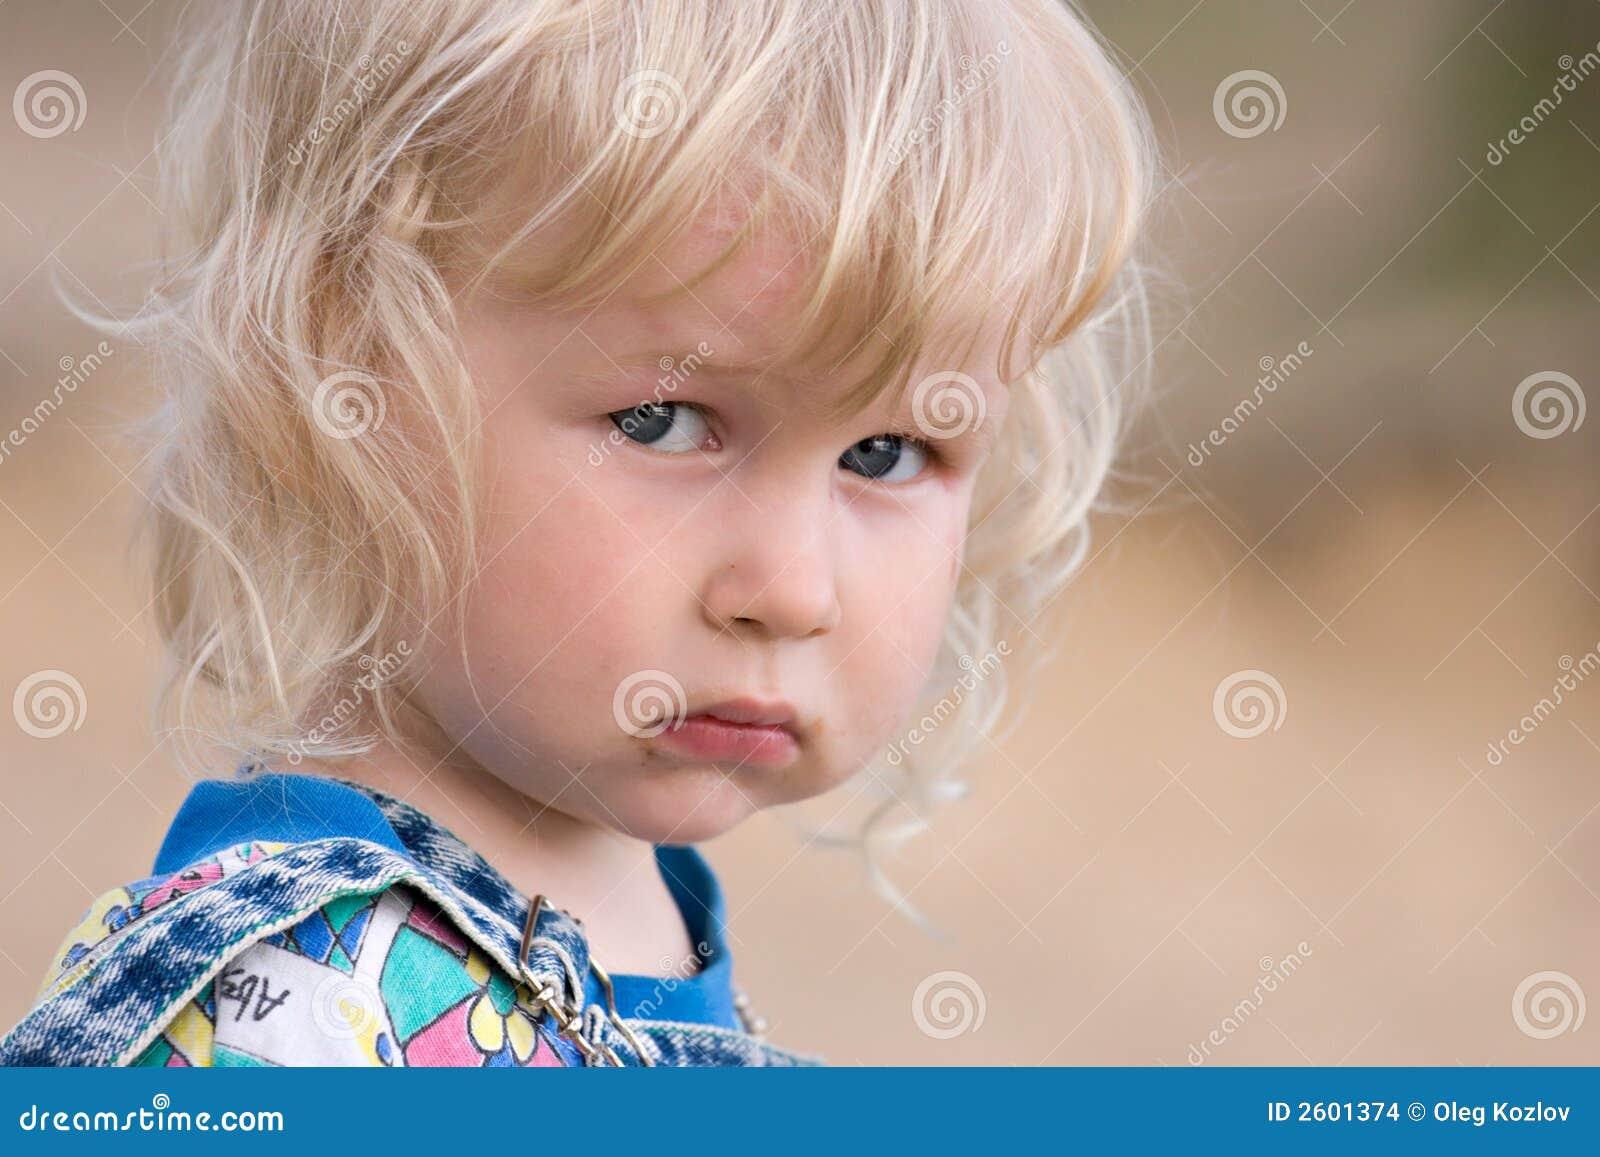 Sad Baby Stock Images  Image: 2601374